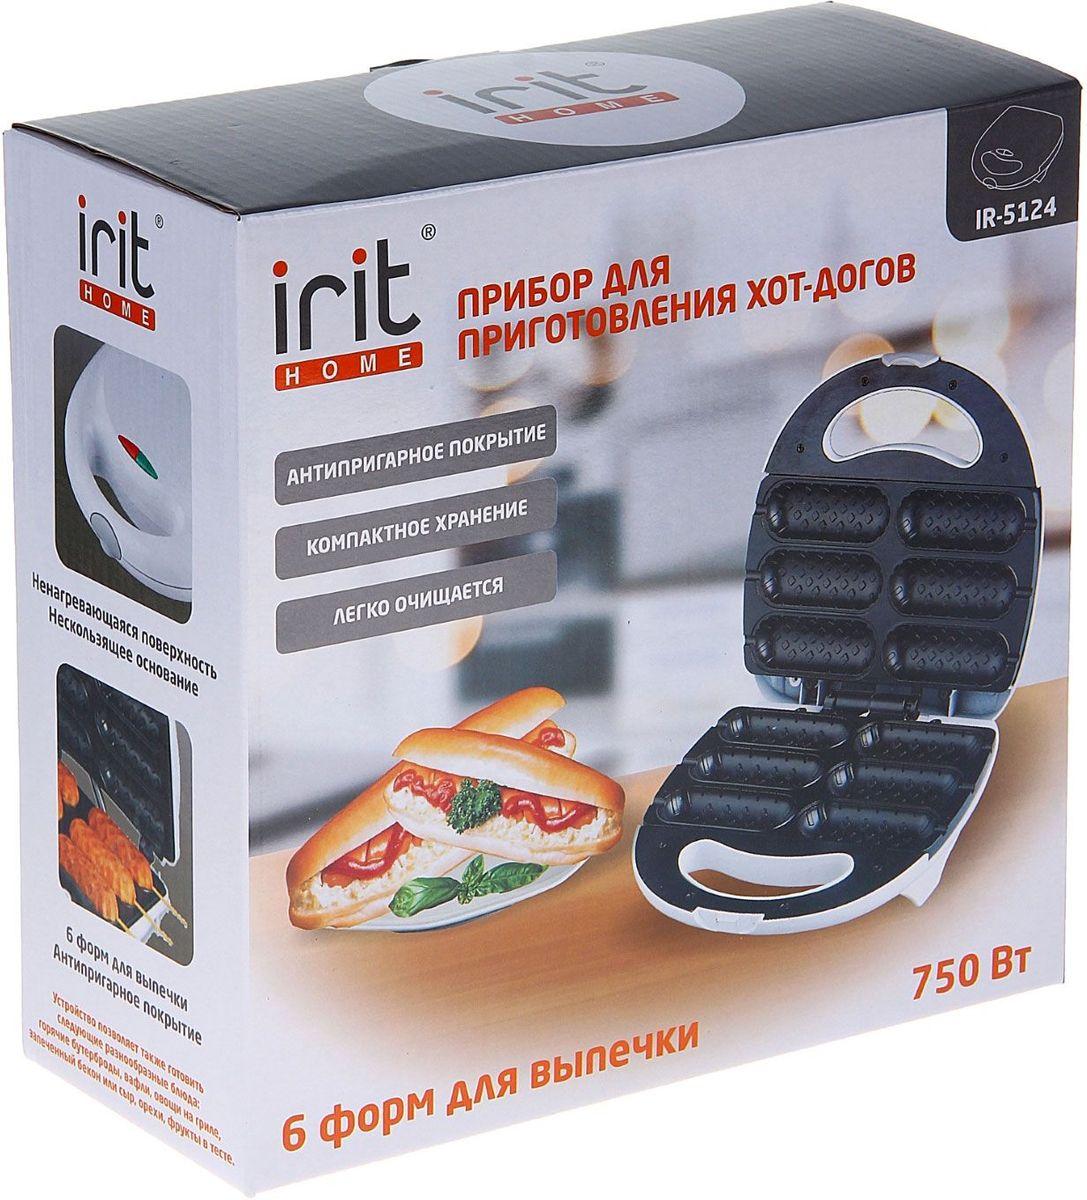 Irit IR-5124, Whiteхотдог мейкер IRIT